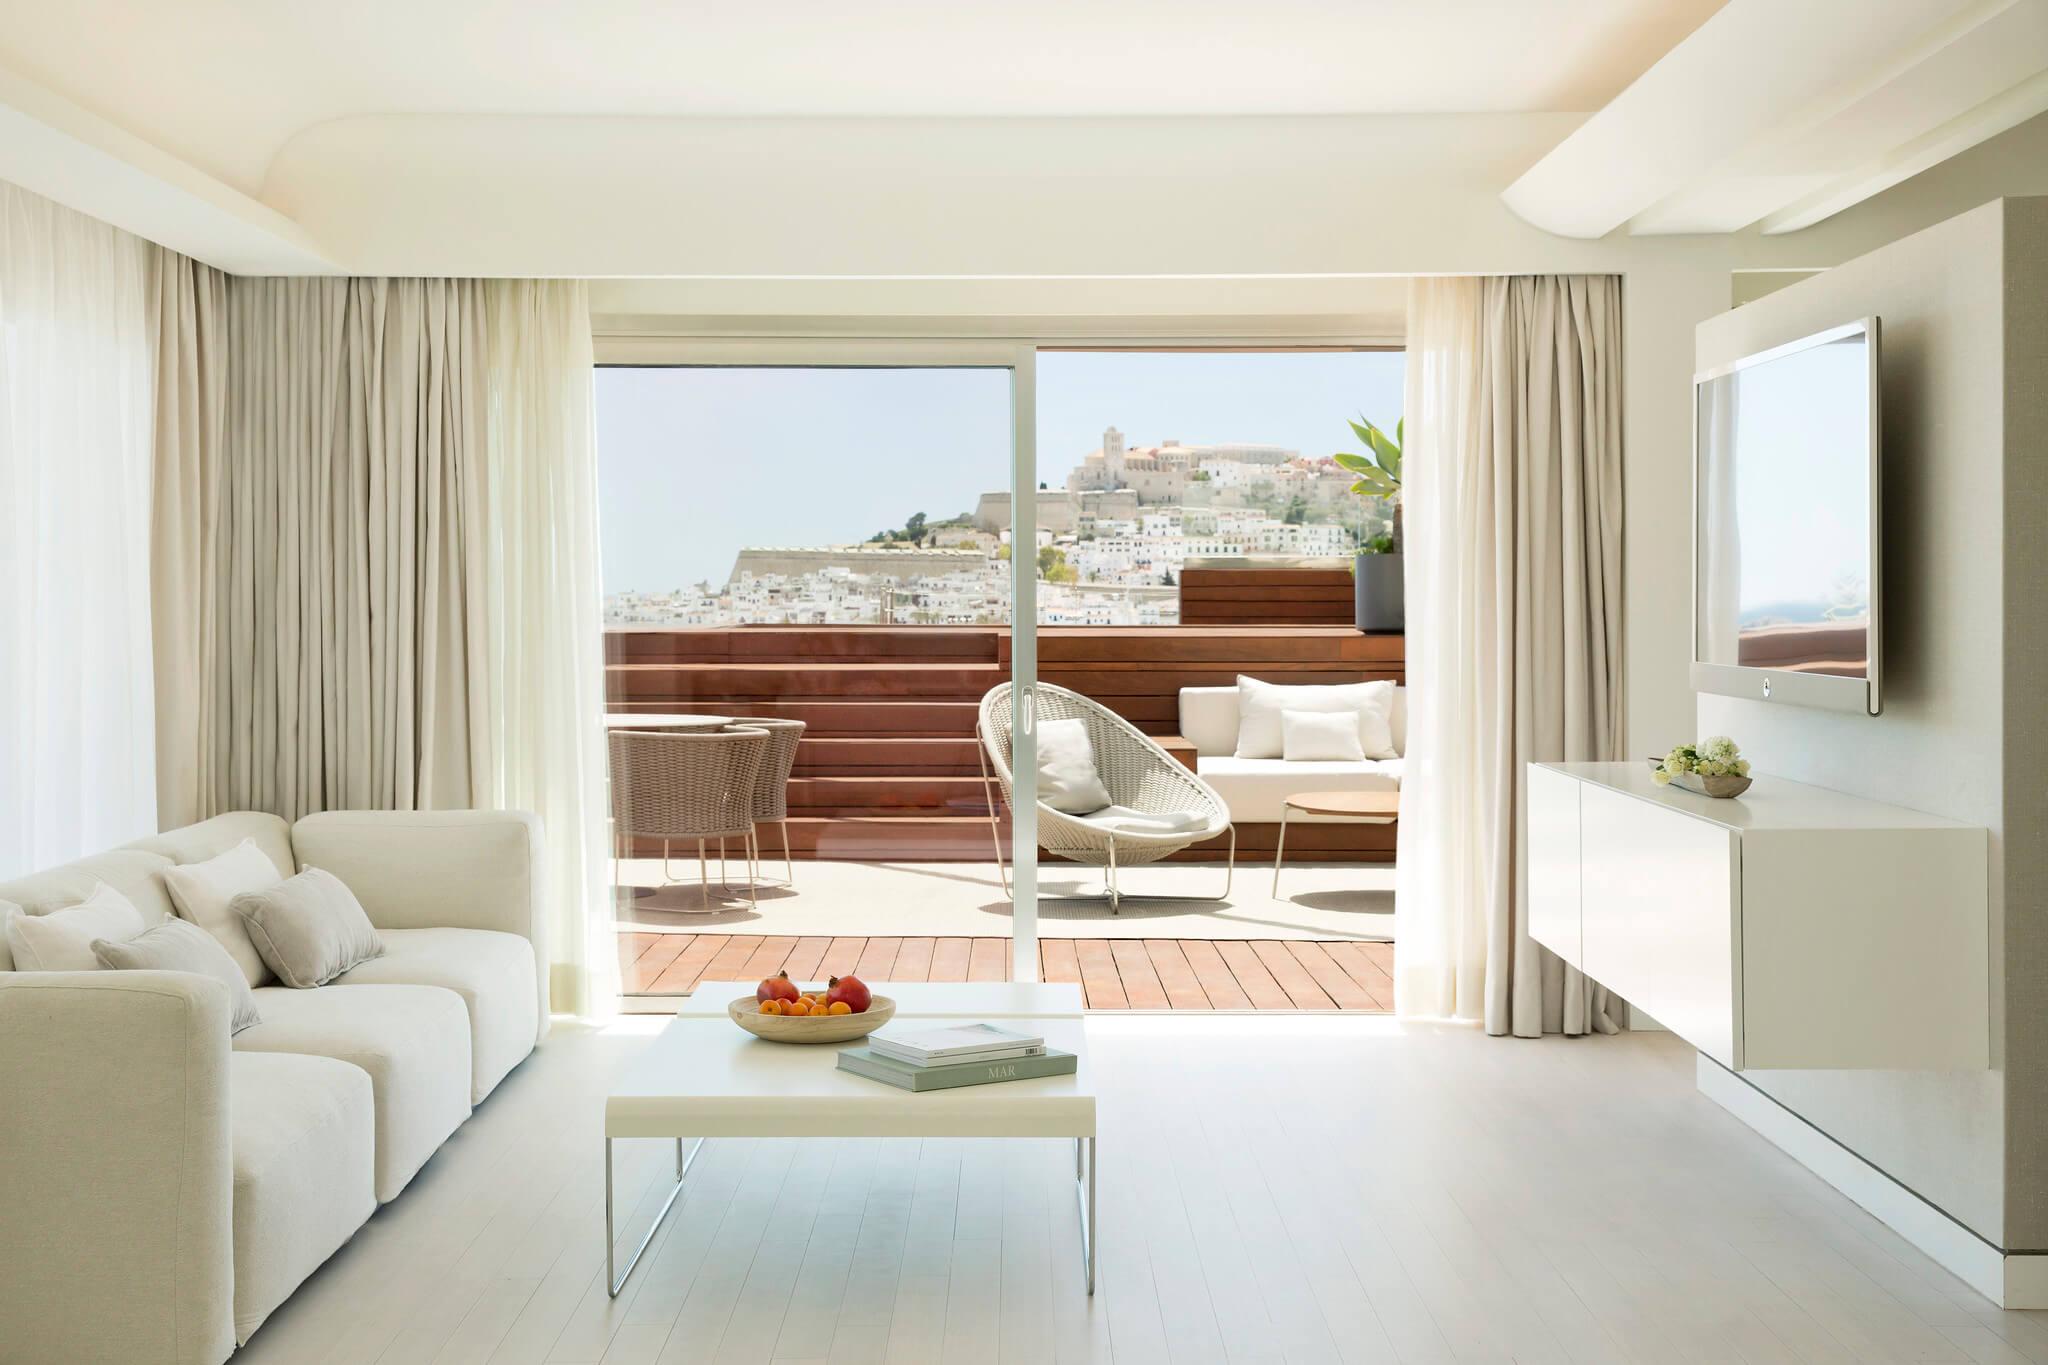 https://www.white-ibiza.com/wp-content/uploads/2020/02/white-ibiza-hotels-ibiza-gran-hotel-2020-00.jpg